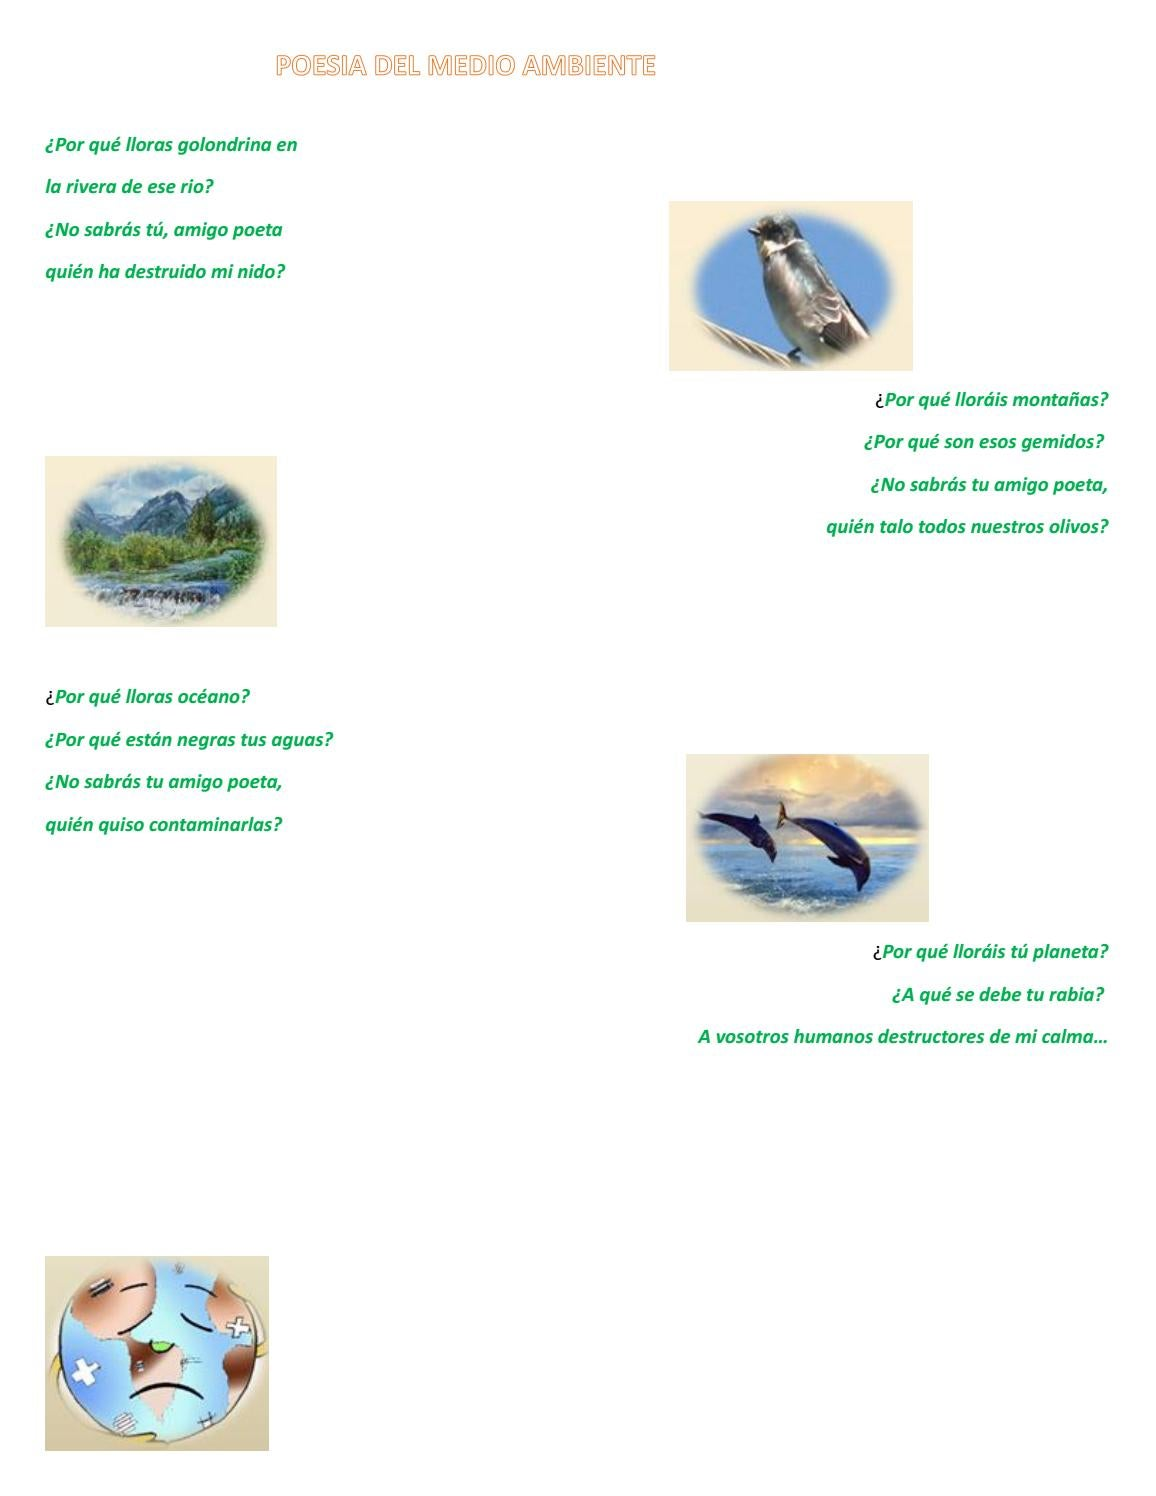 Poema Al Medio Ambiente By Tboxplanet18 Issuu